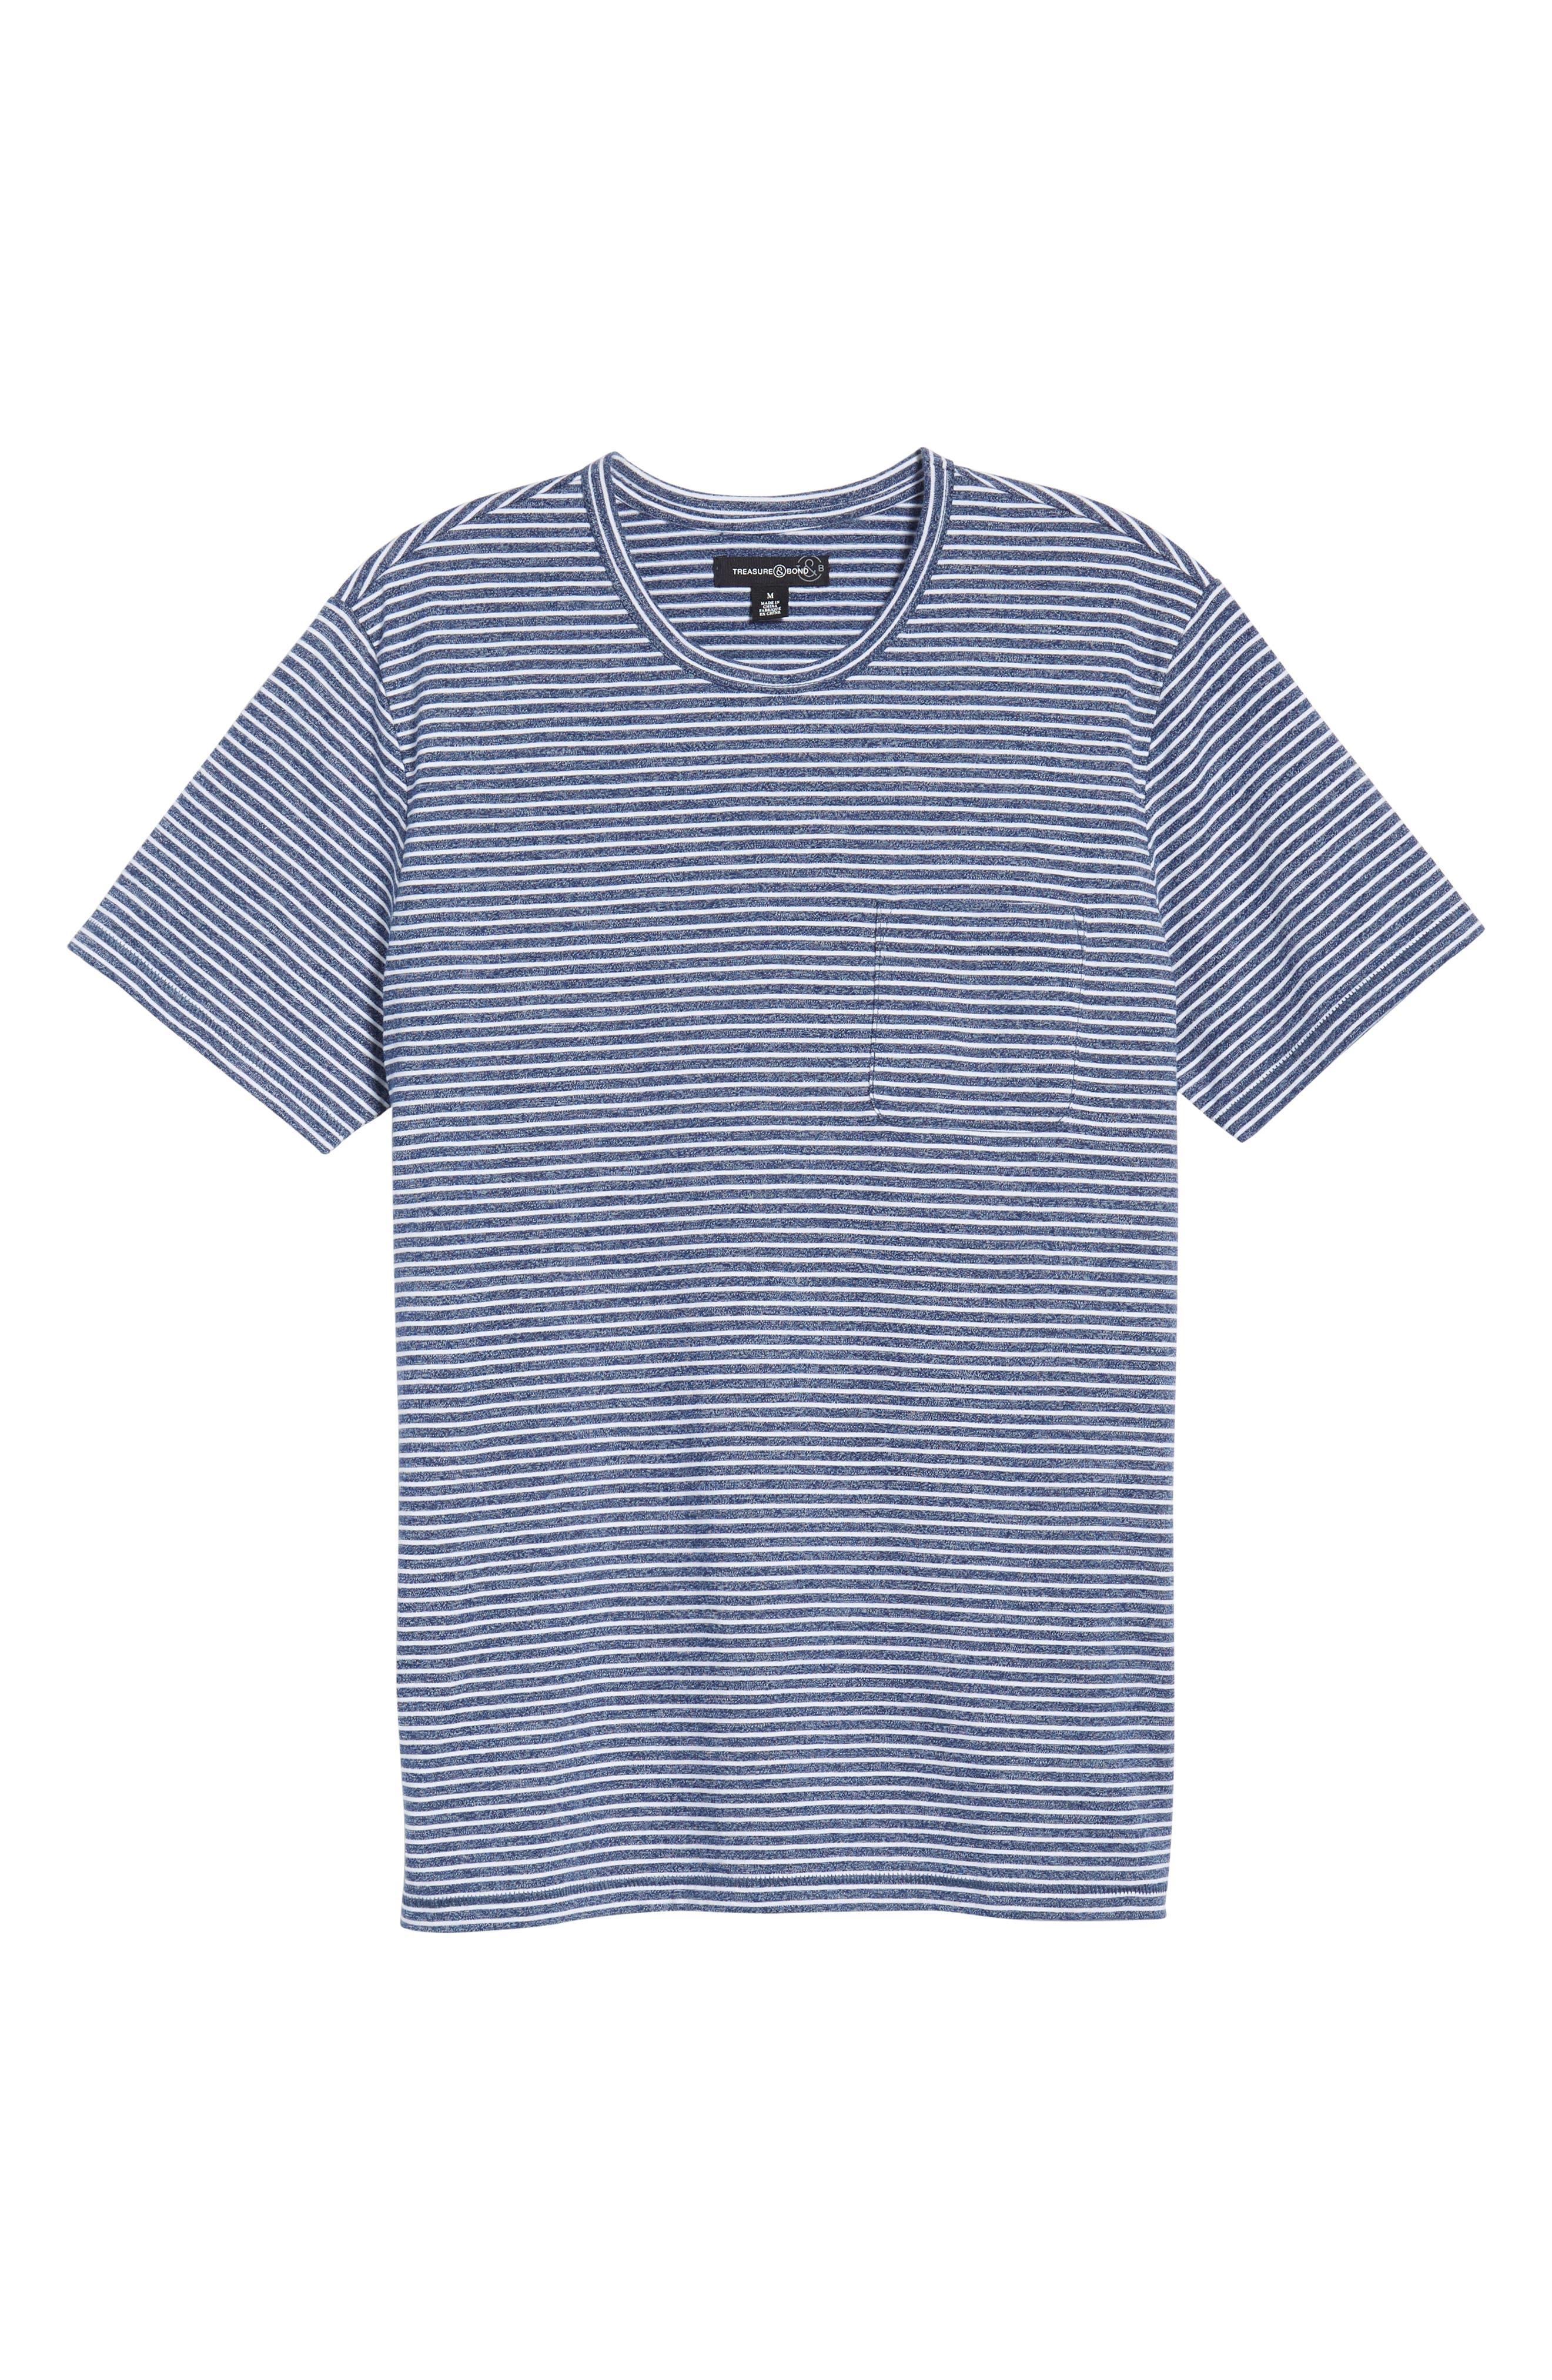 Yarn Dyed Stripe T-Shirt,                             Alternate thumbnail 6, color,                             NAVY IRIS STRIPE